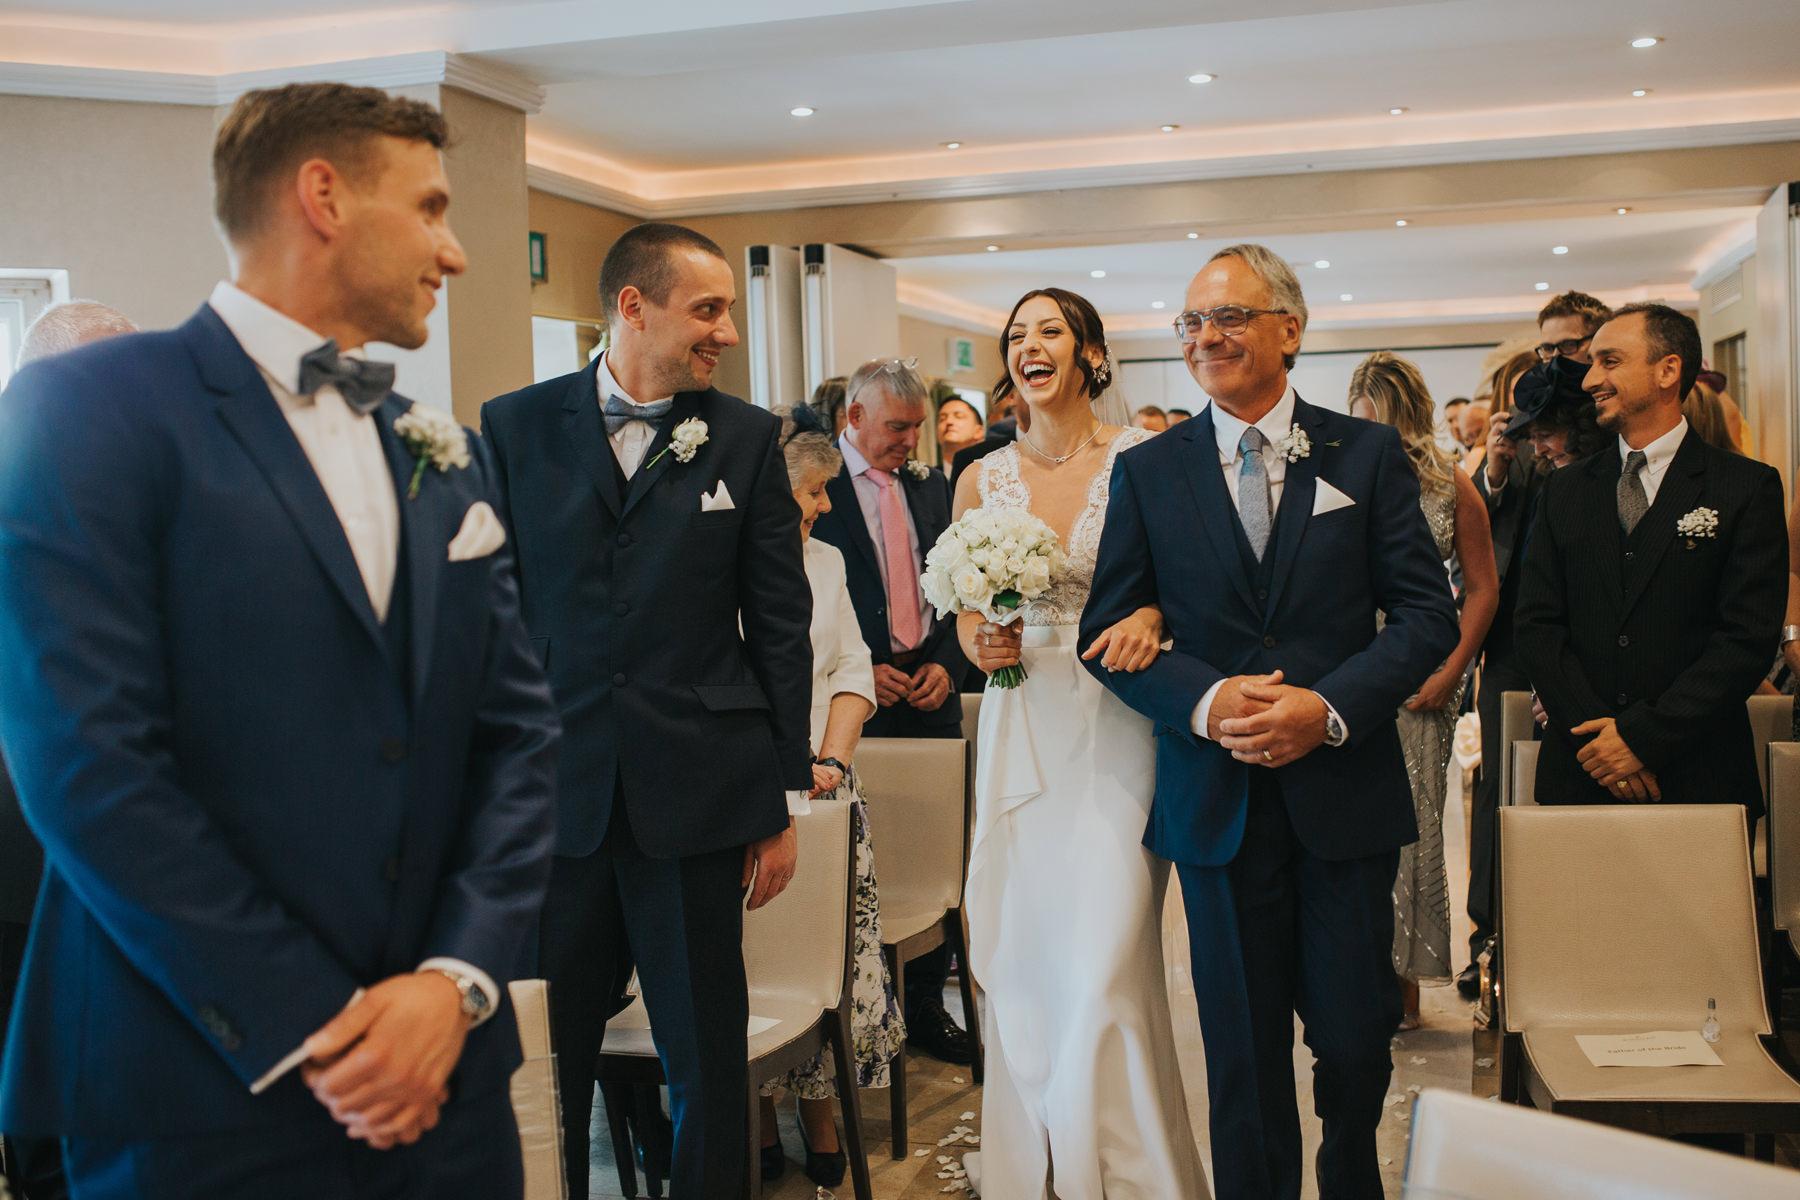 The Bingham Wedding Photographer London--groom waiting bride coming down aisle-CRL-131.jpg